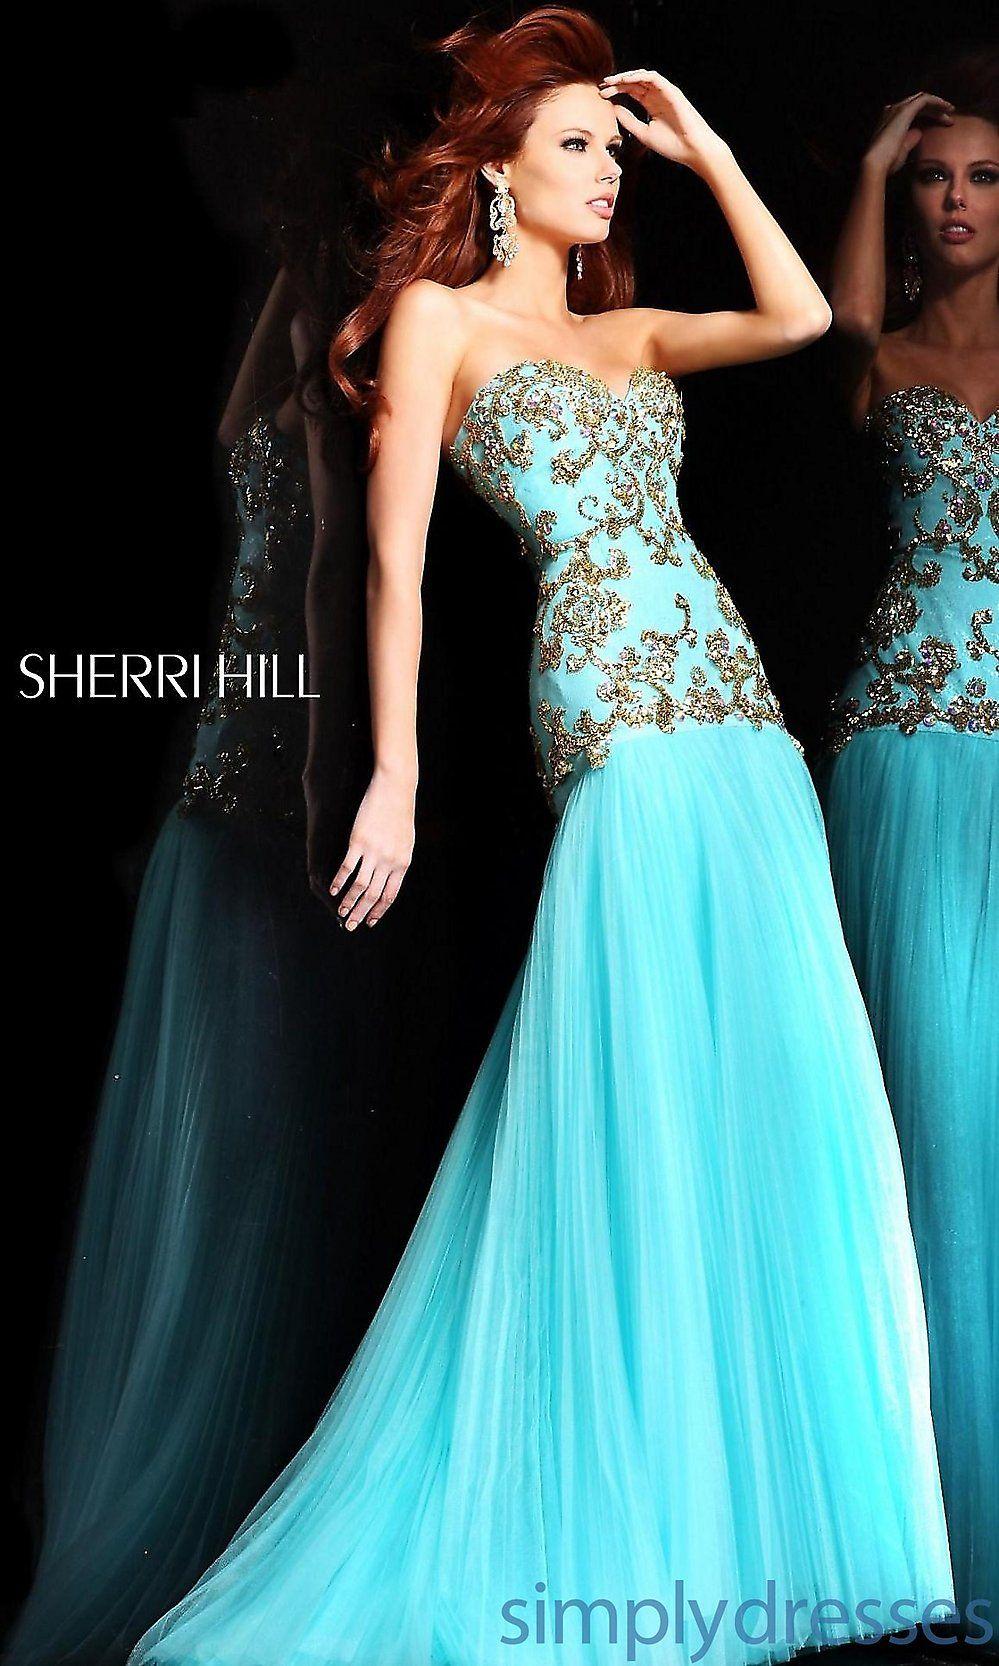 Sherri Hill Strapless Gown, Elegant Prom Dresses - Simply Dresses ...